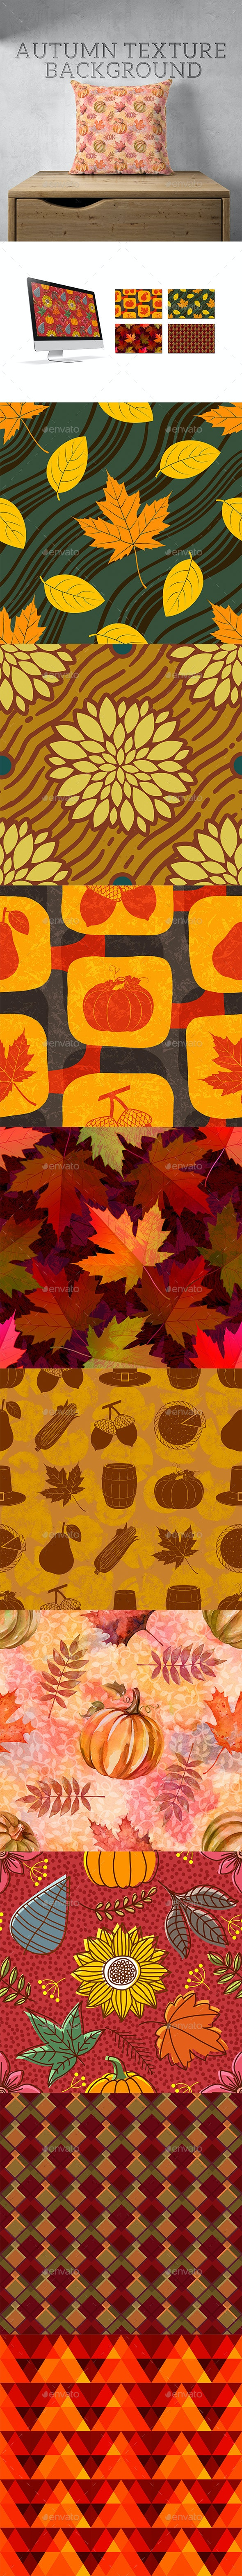 Autumn Texture Background - Patterns Backgrounds